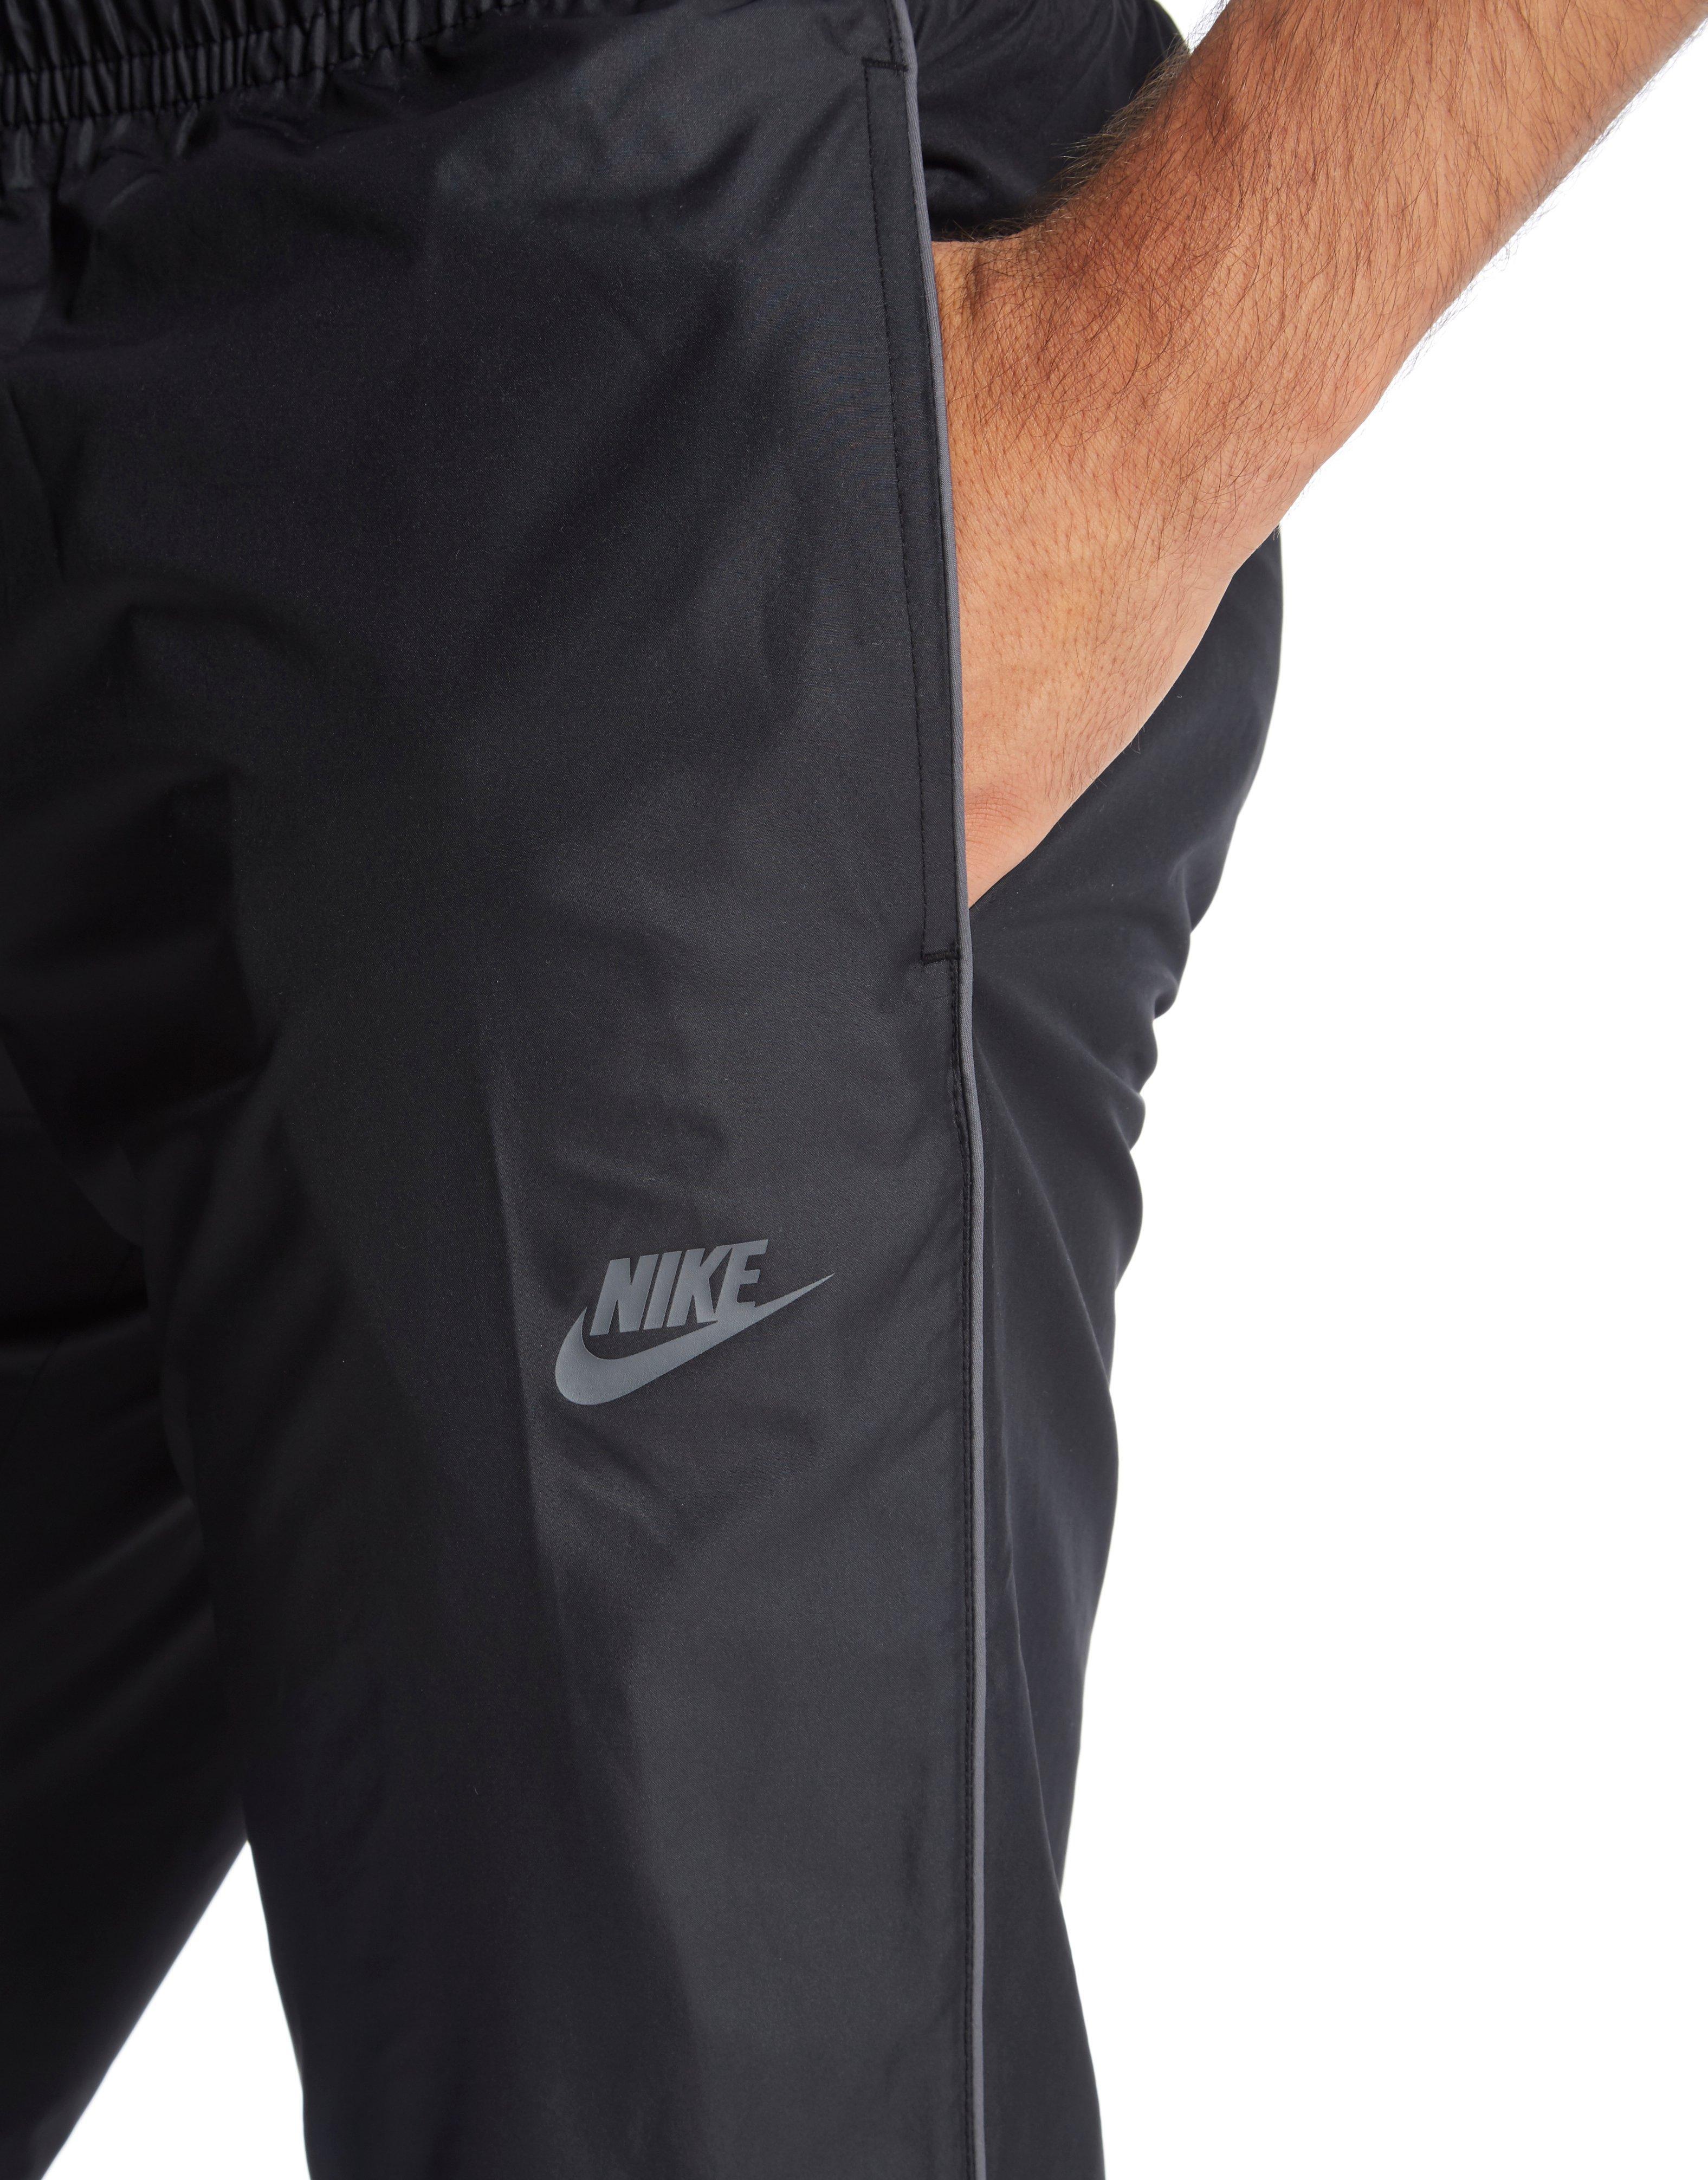 8915e4950c7 Lyst - Nike Shutout Pants in Black for Men